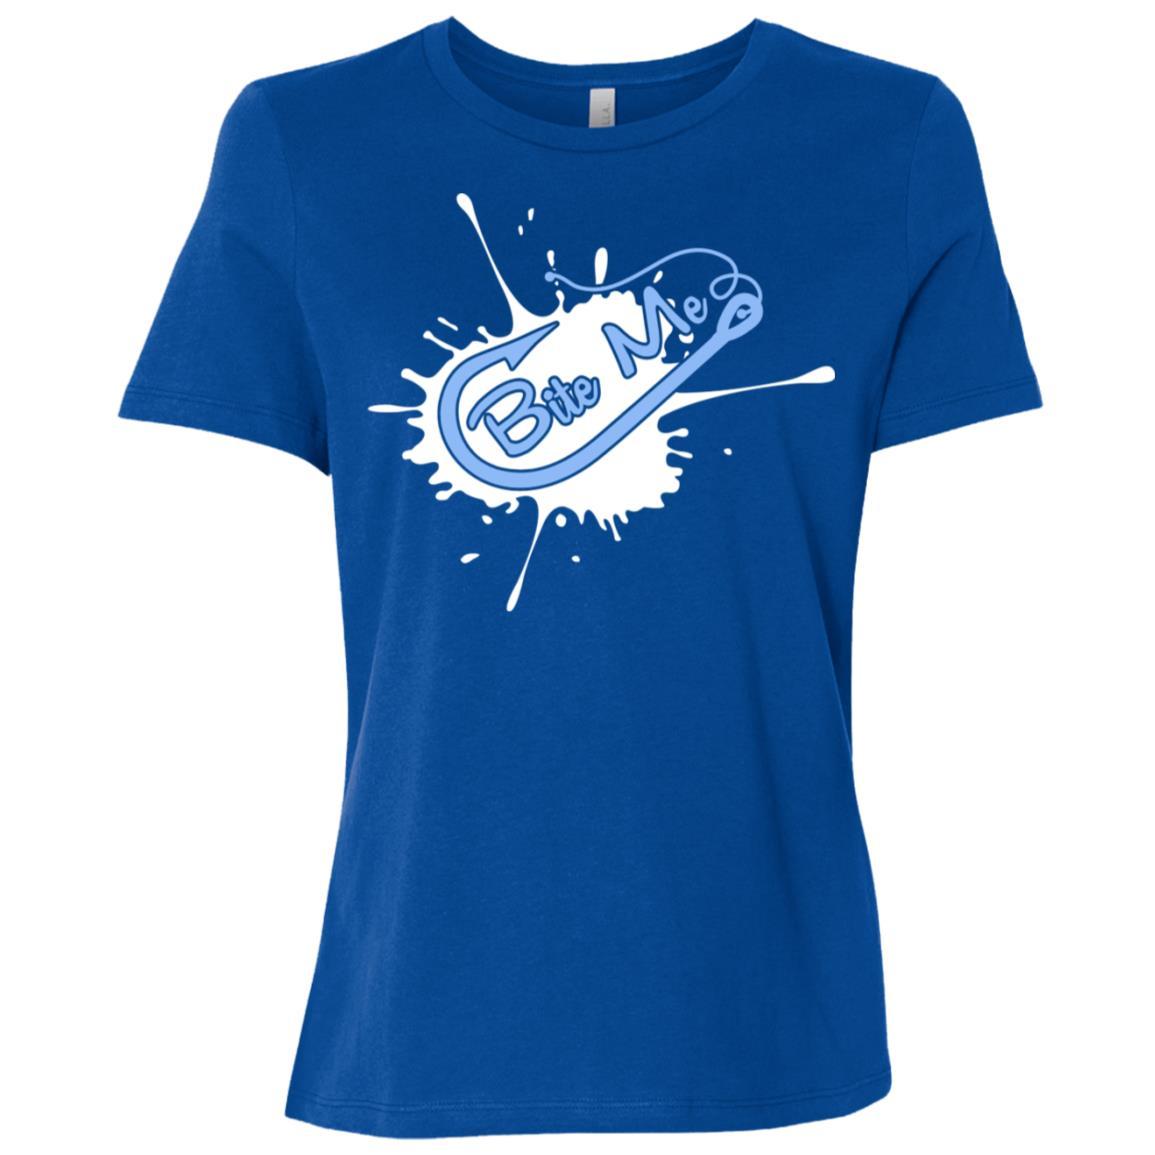 Fly Bass Fishing Camping Wildlife Hunting Funny -3 Women Short Sleeve T-Shirt